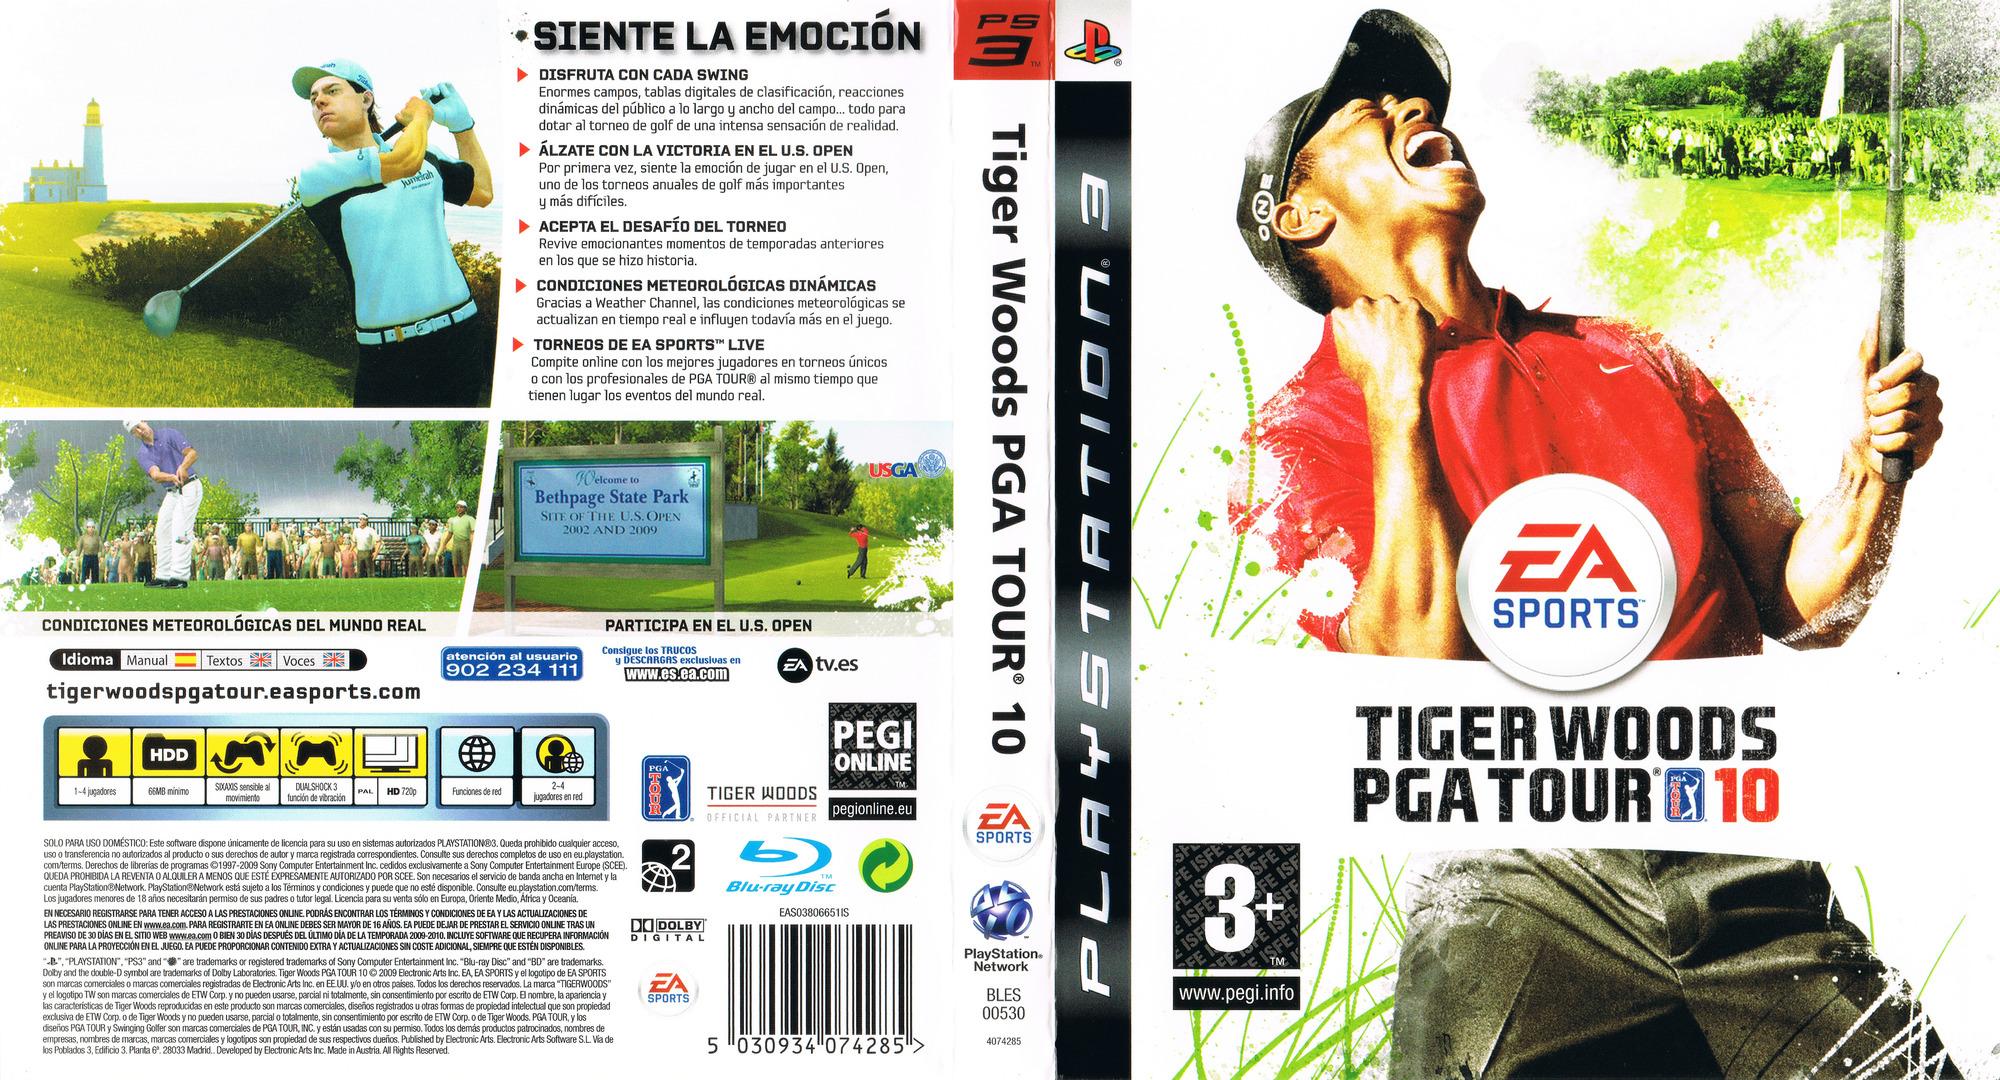 Tiger Woods PGA Tour 10 PS3 coverfullHQ (BLES00530)